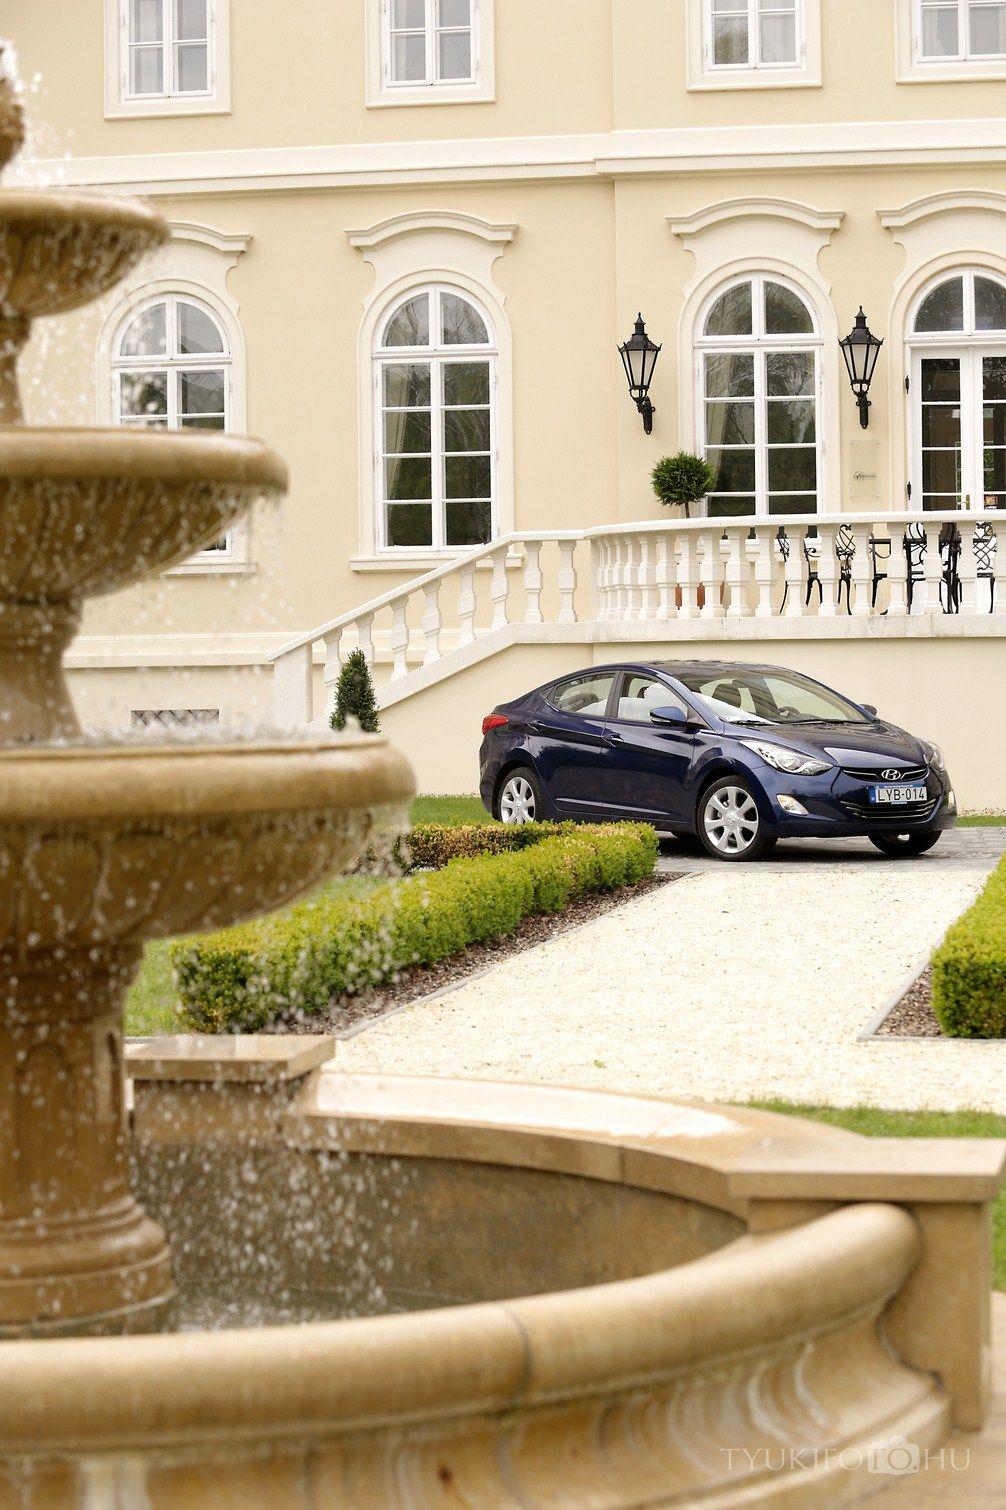 Hyundai Elantra Hyundai elantra, House styles, Elantra